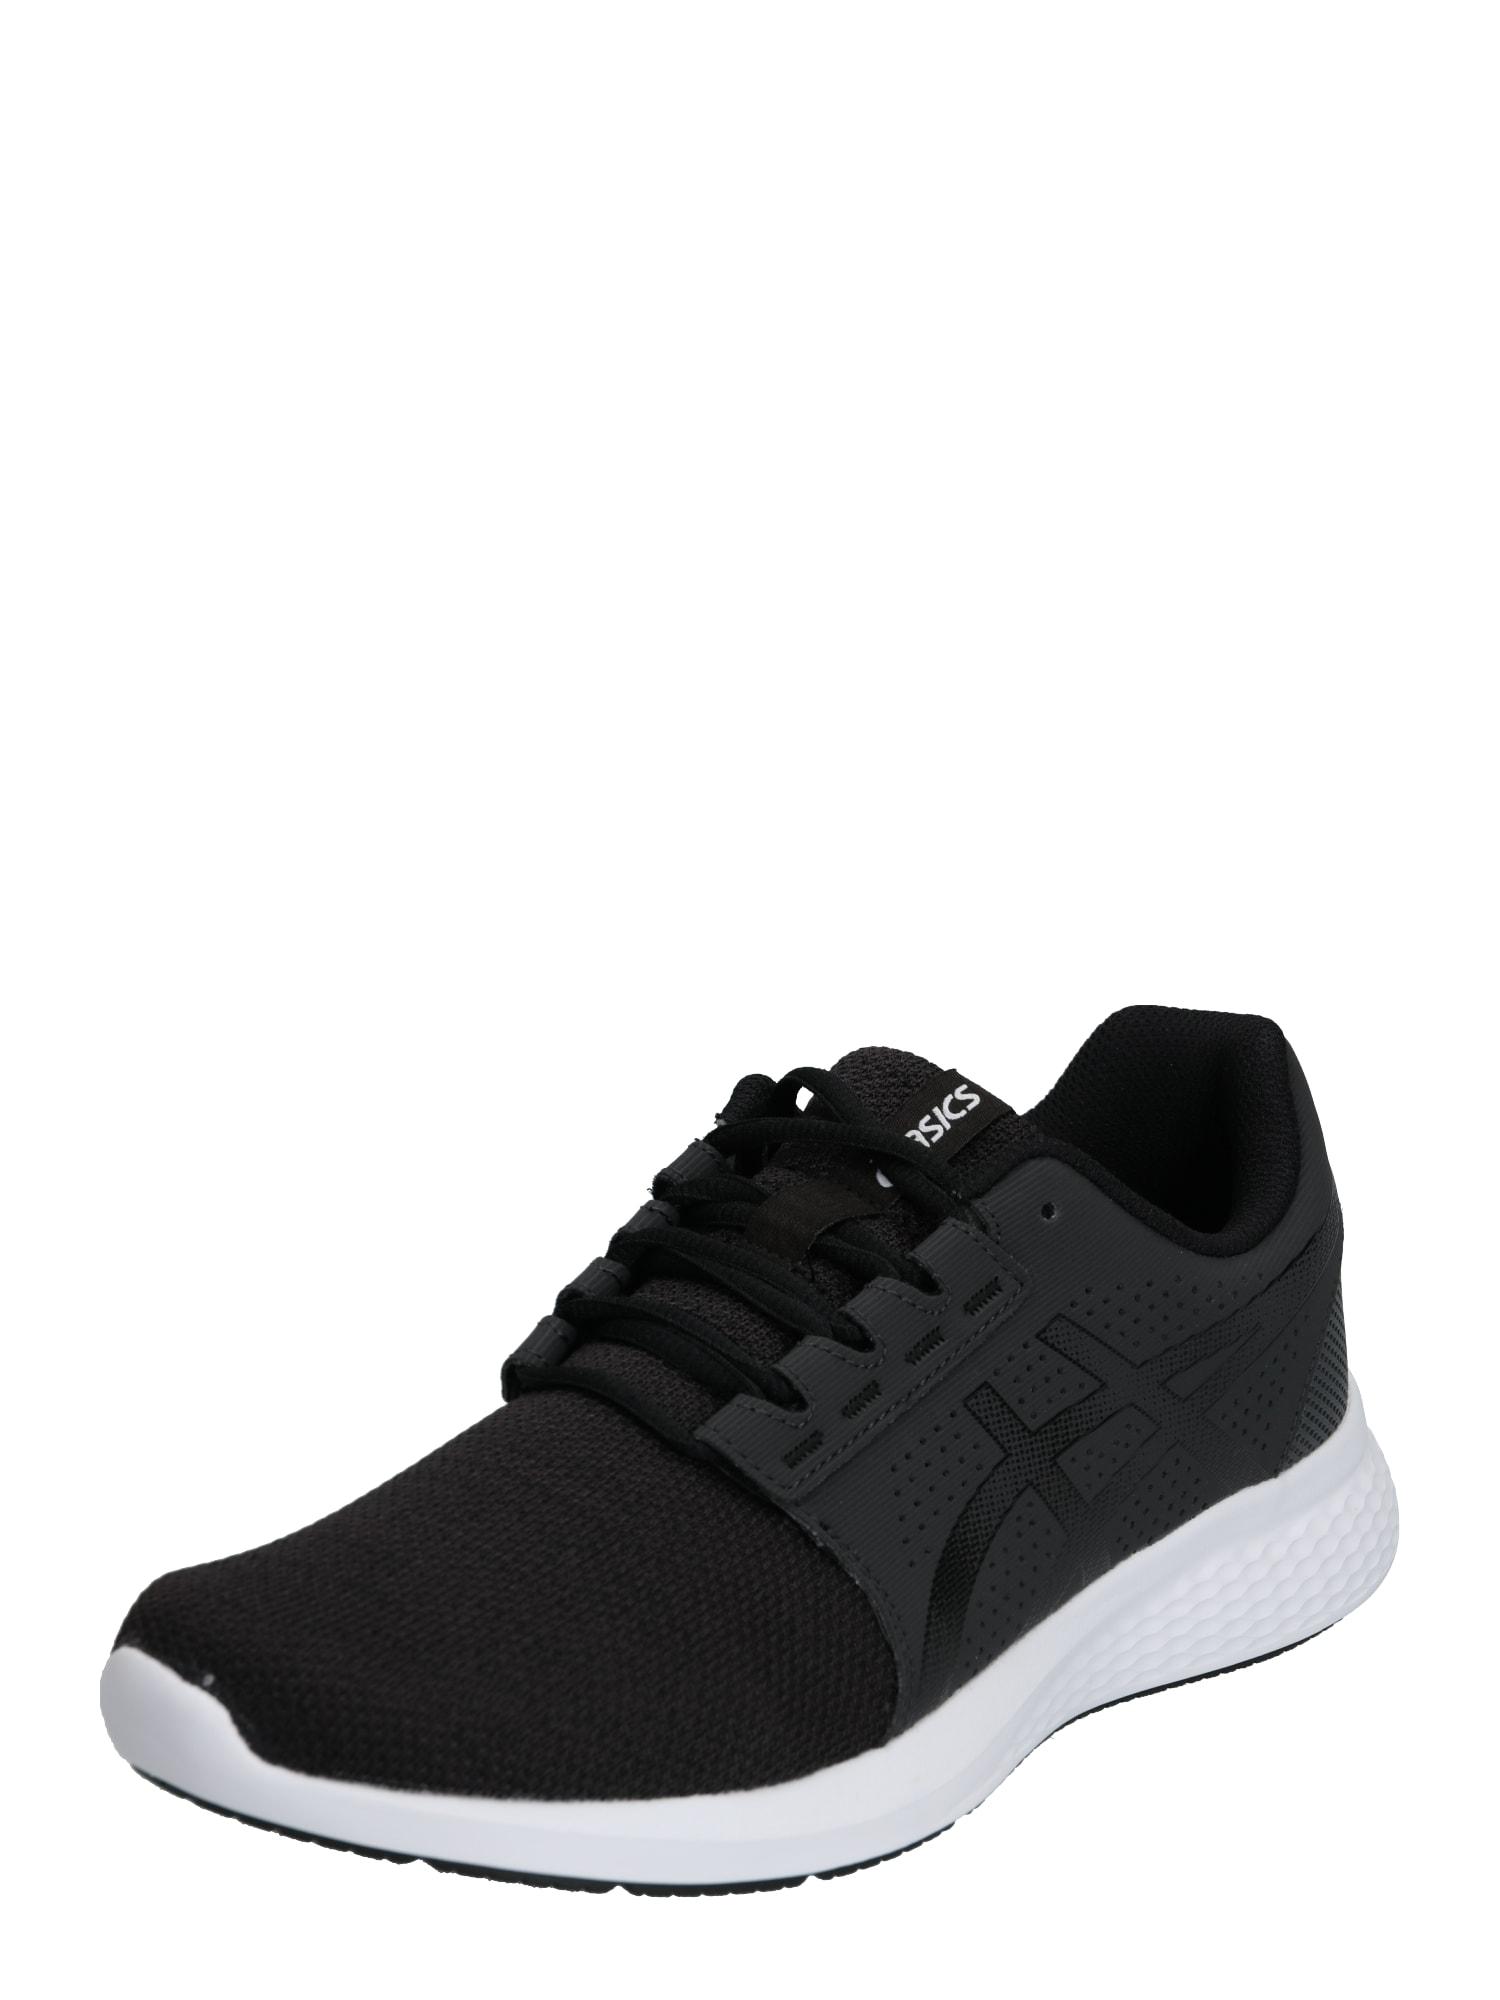 ASICS Bėgimo batai 'GEL-TORRANCE 2' balta / grafito / juoda